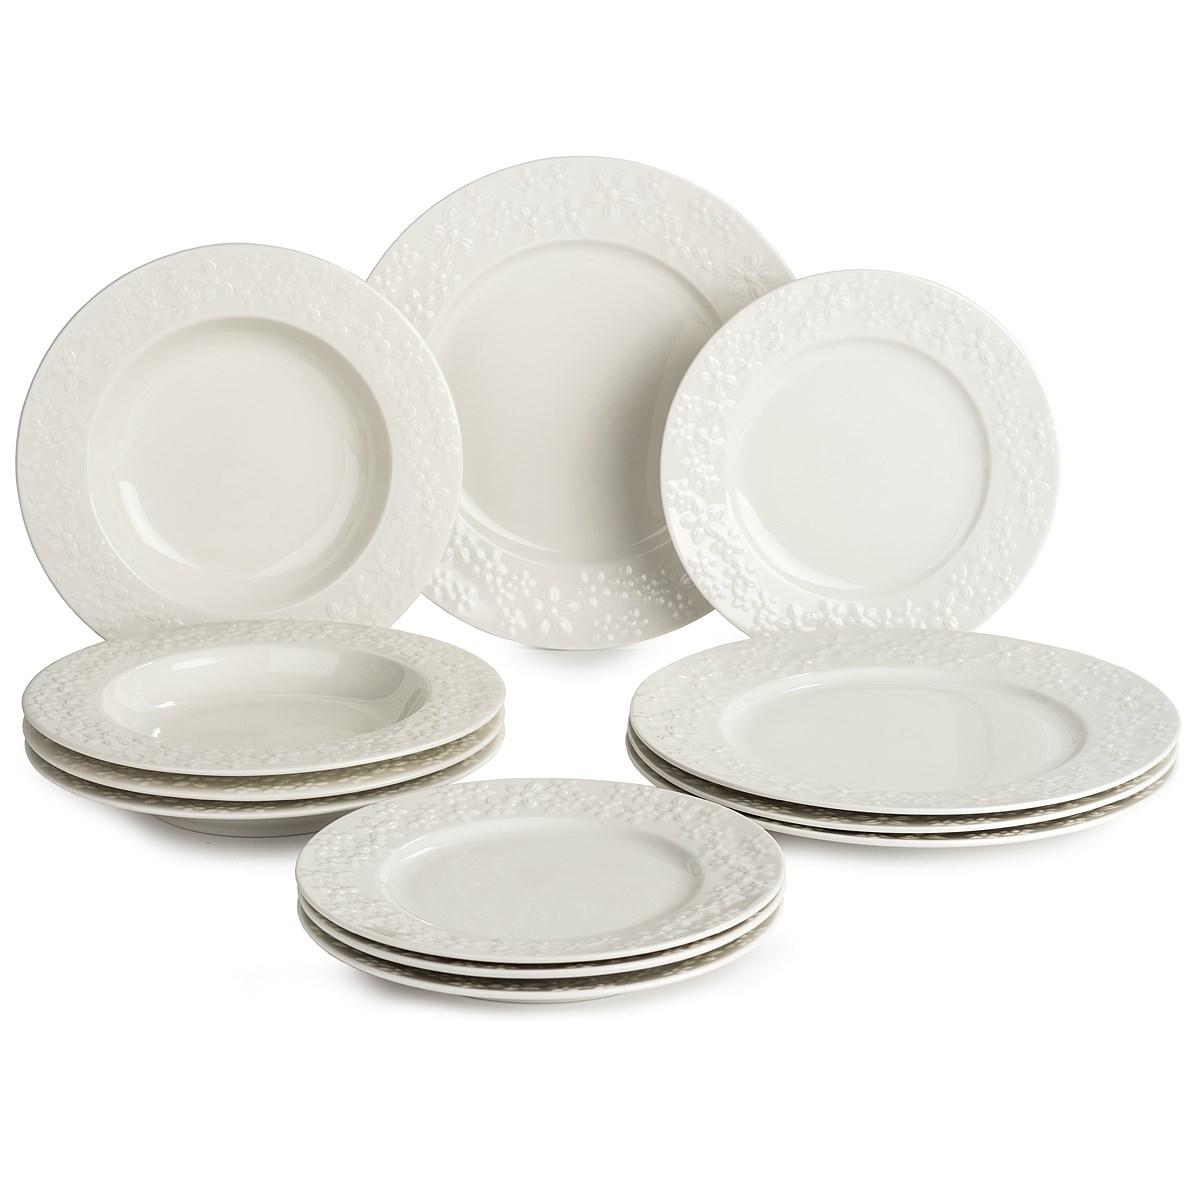 Banquet Blanche súprava tanierov 482906e47ea